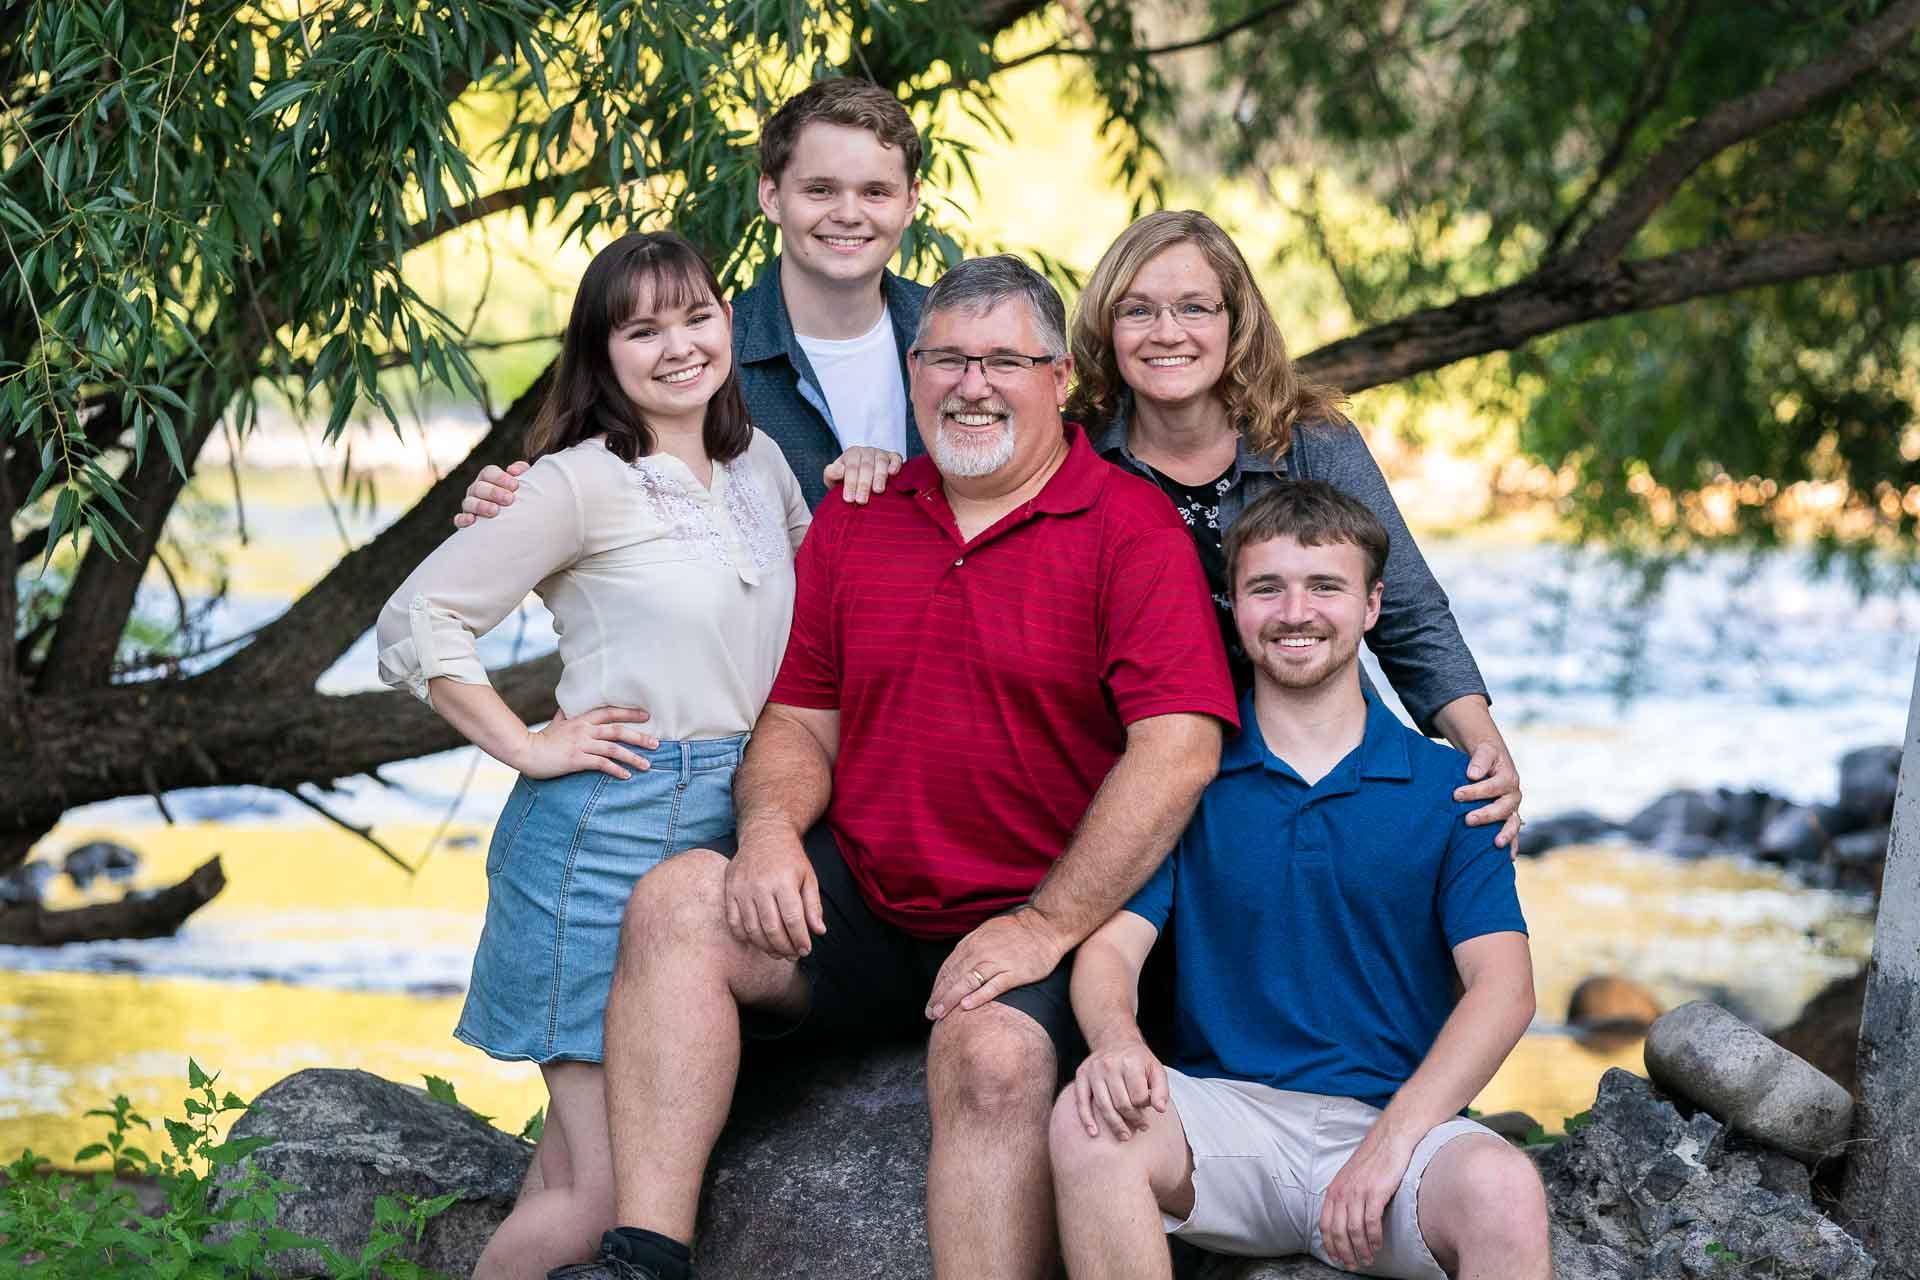 Family photo taken on the Spokane River